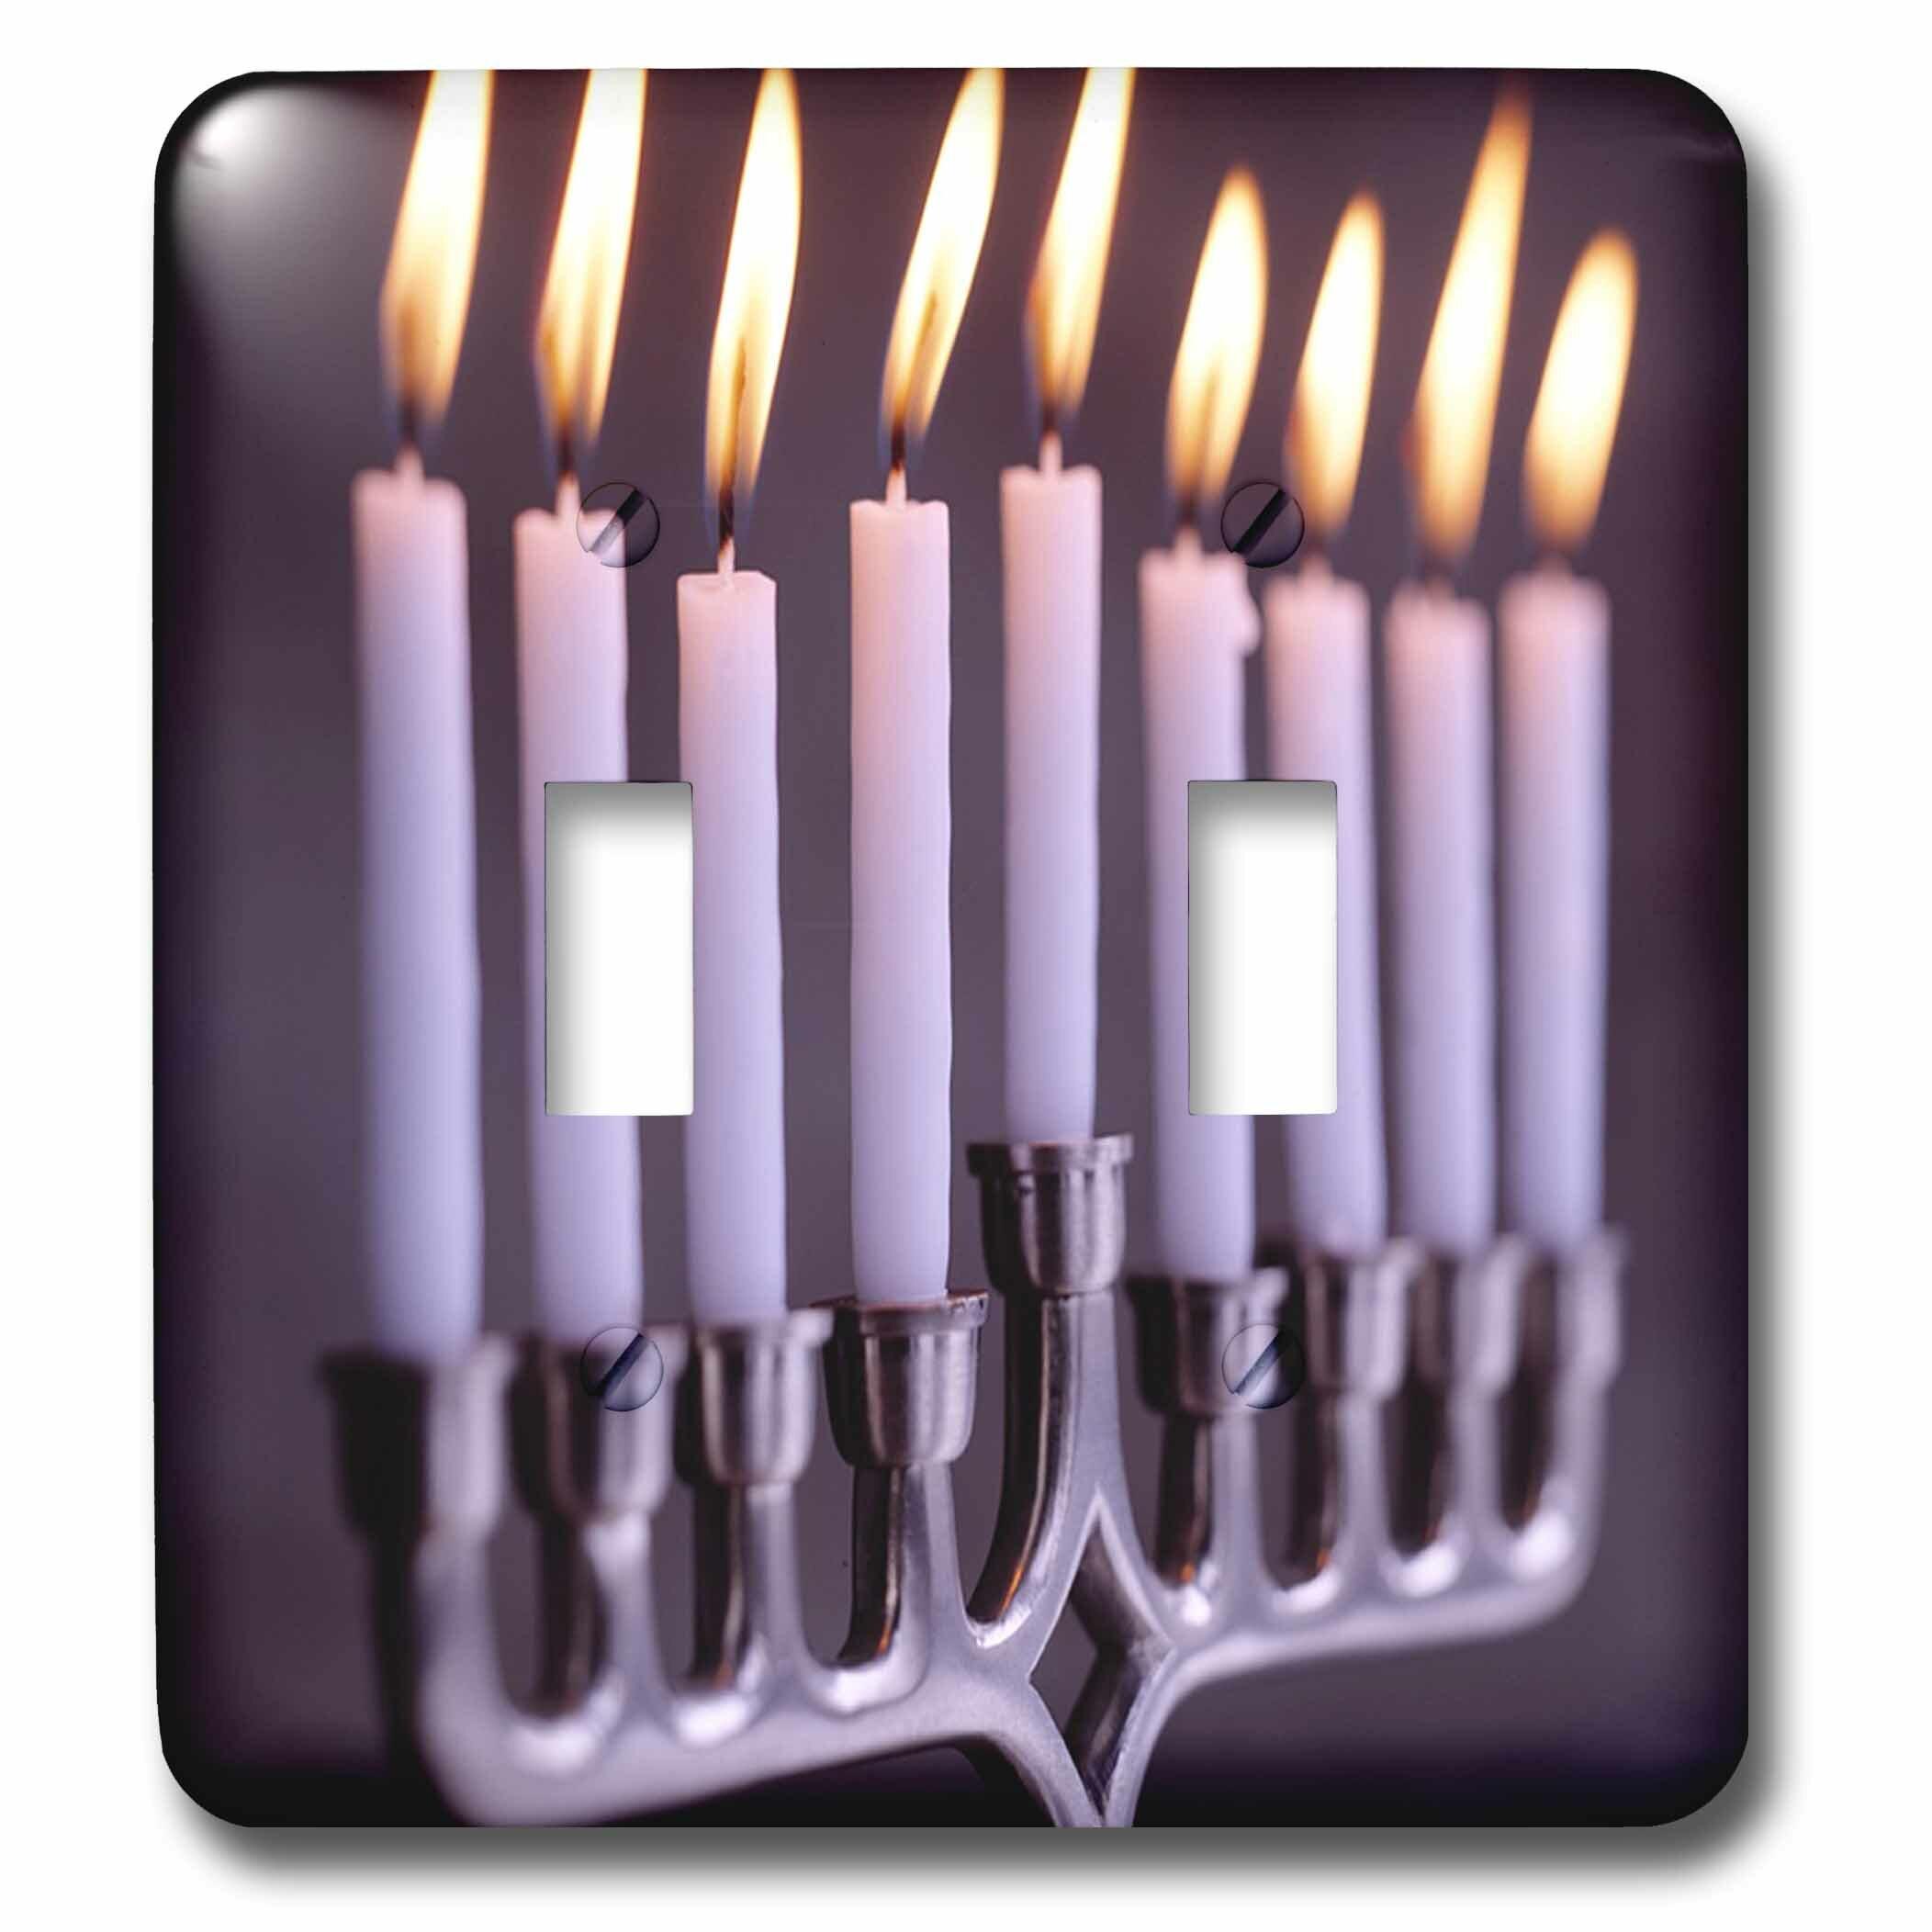 3drose Hanukkah Candles 2 Gang Toggle Light Switch Wall Plate Wayfair